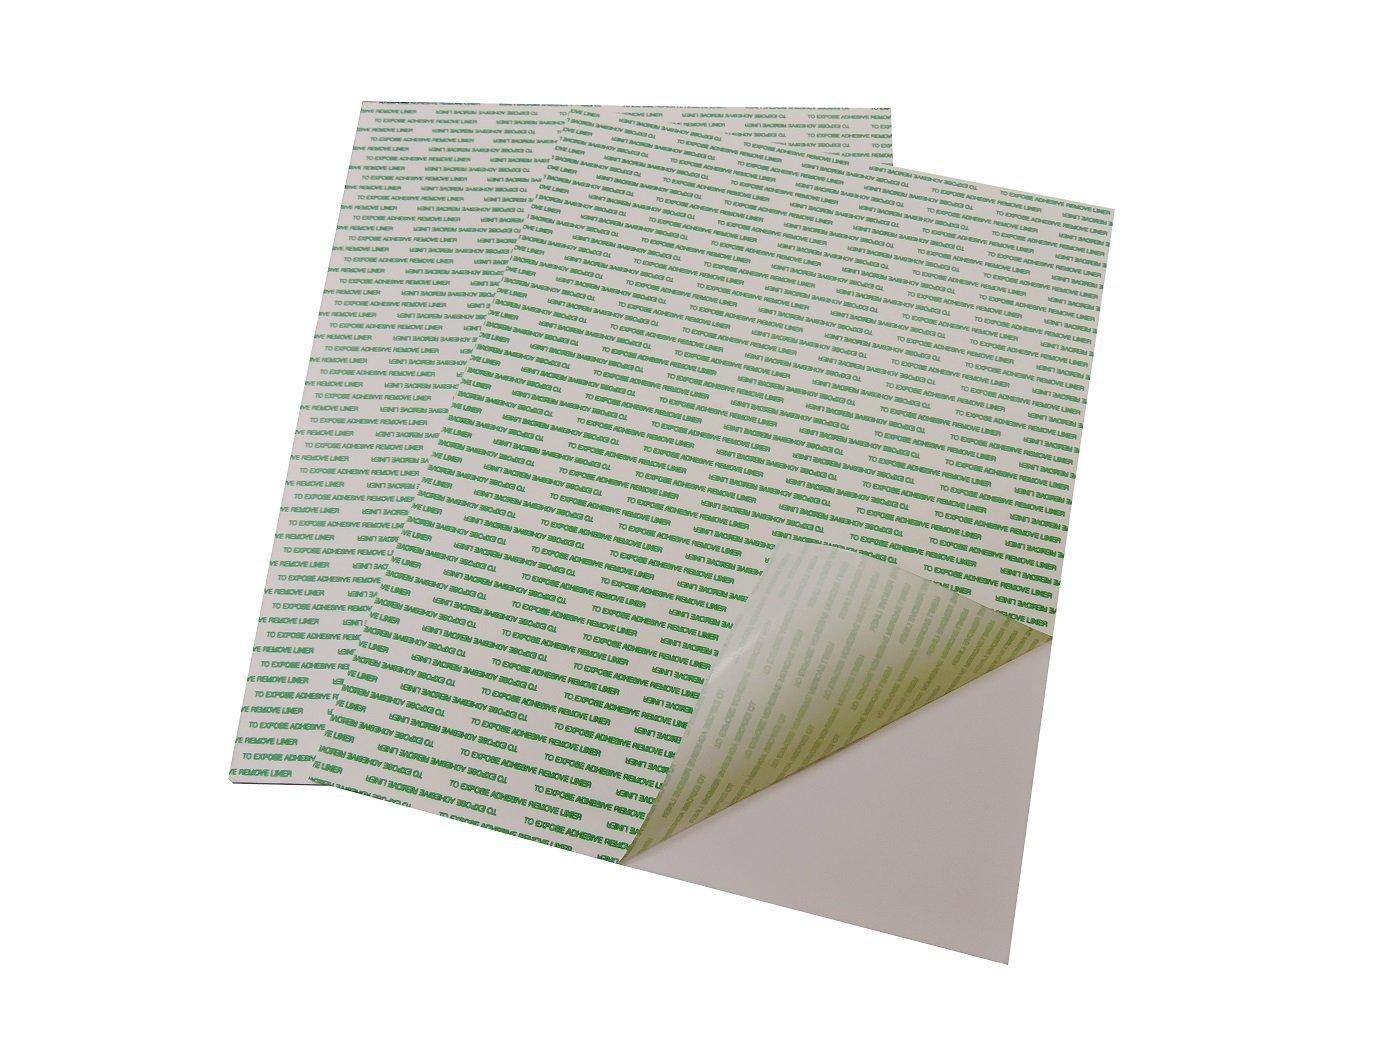 Self-stick Repositionable Foam Boards 32''x40'' (25)